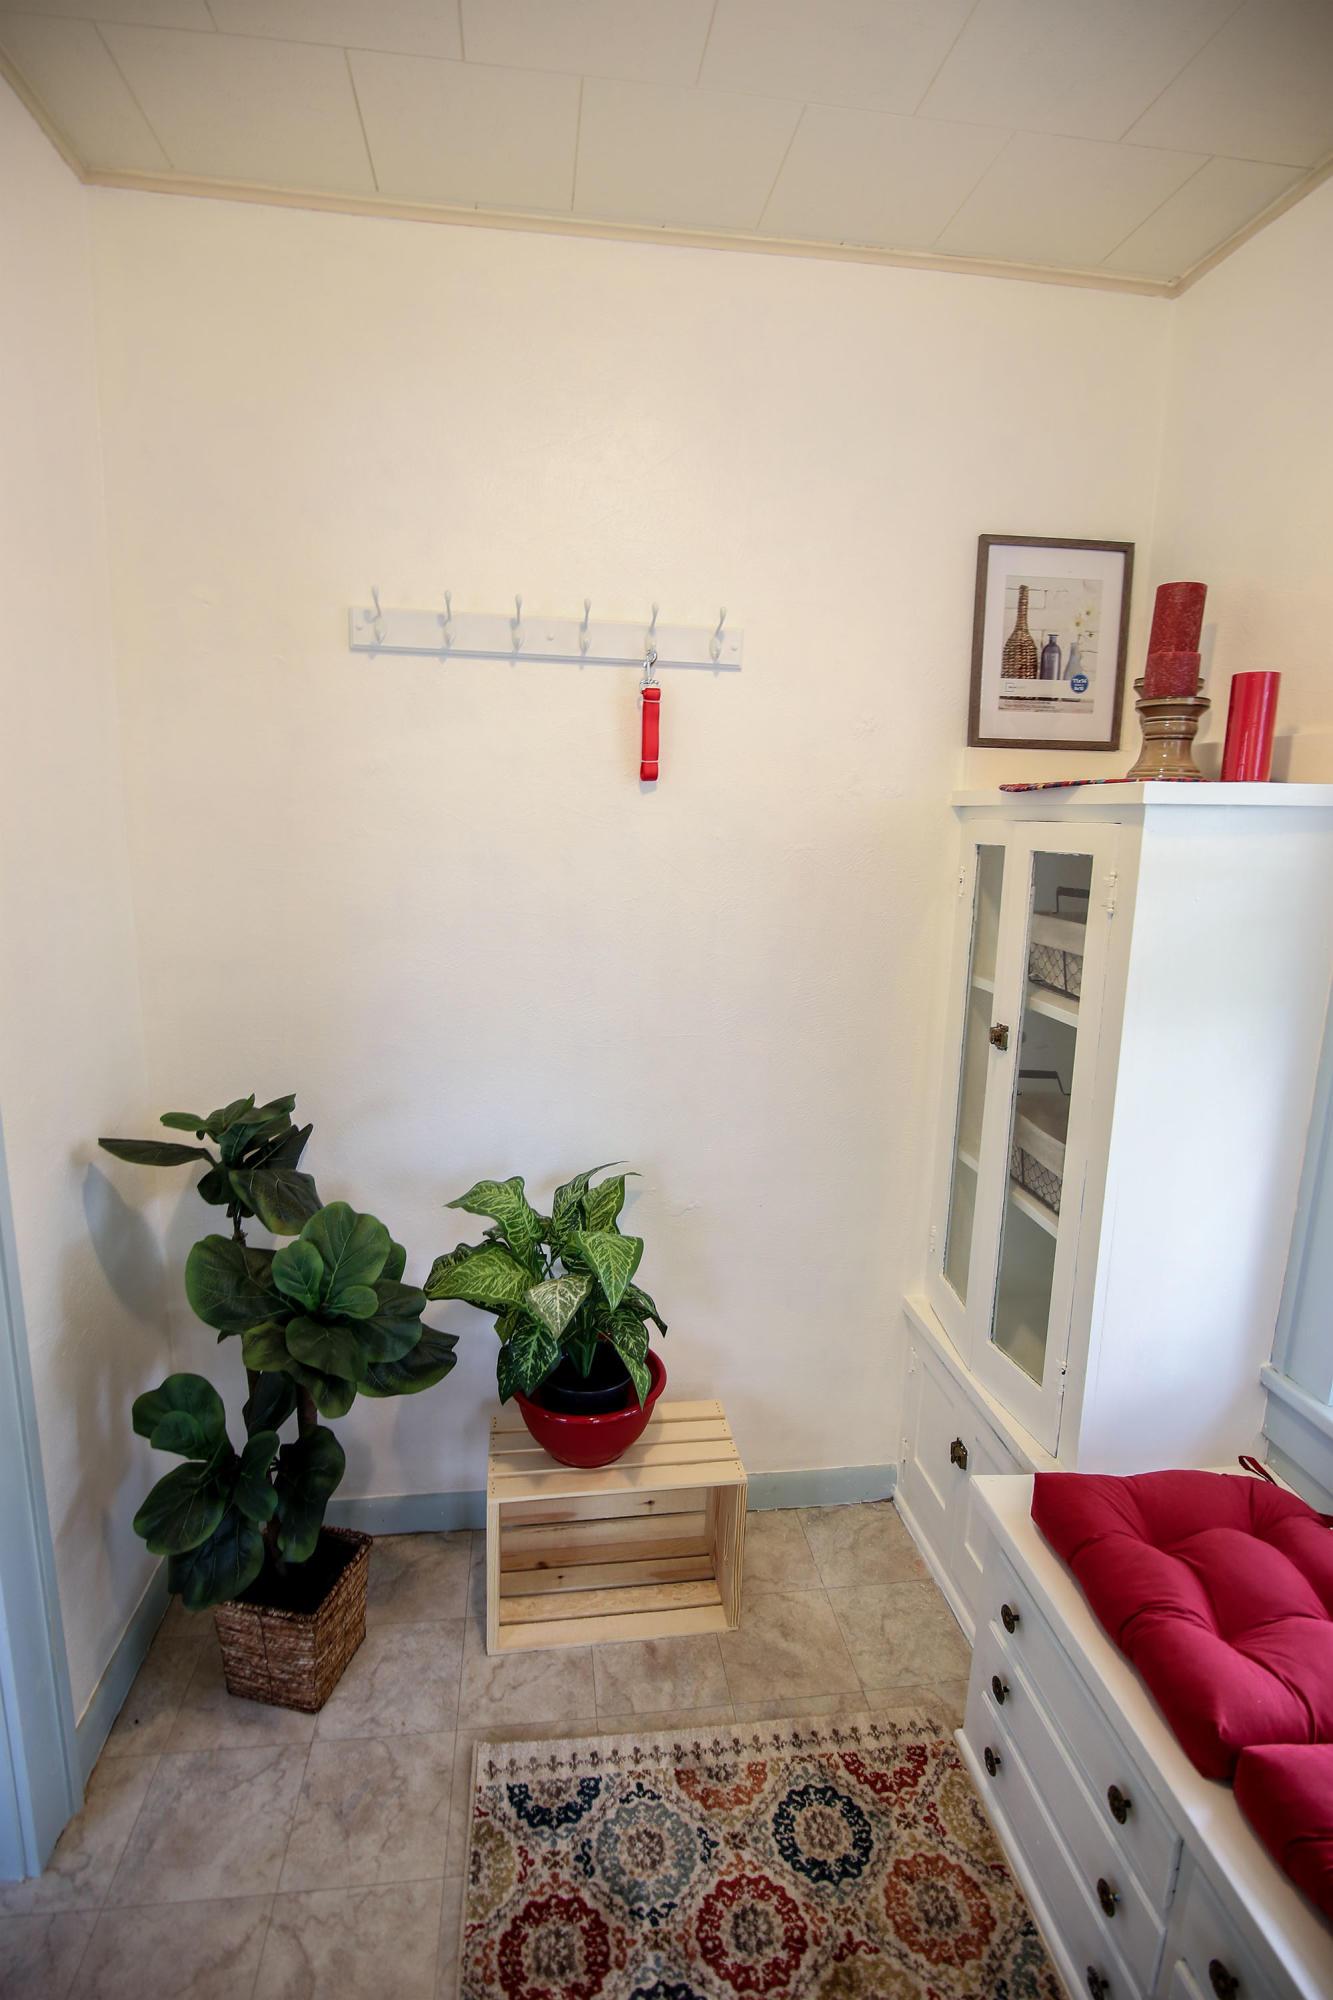 929 Thurmond Street, Sheridan, Wyoming 82801, 2 Bedrooms Bedrooms, ,1 BathroomBathrooms,Residential,For Sale,Thurmond,18-1014